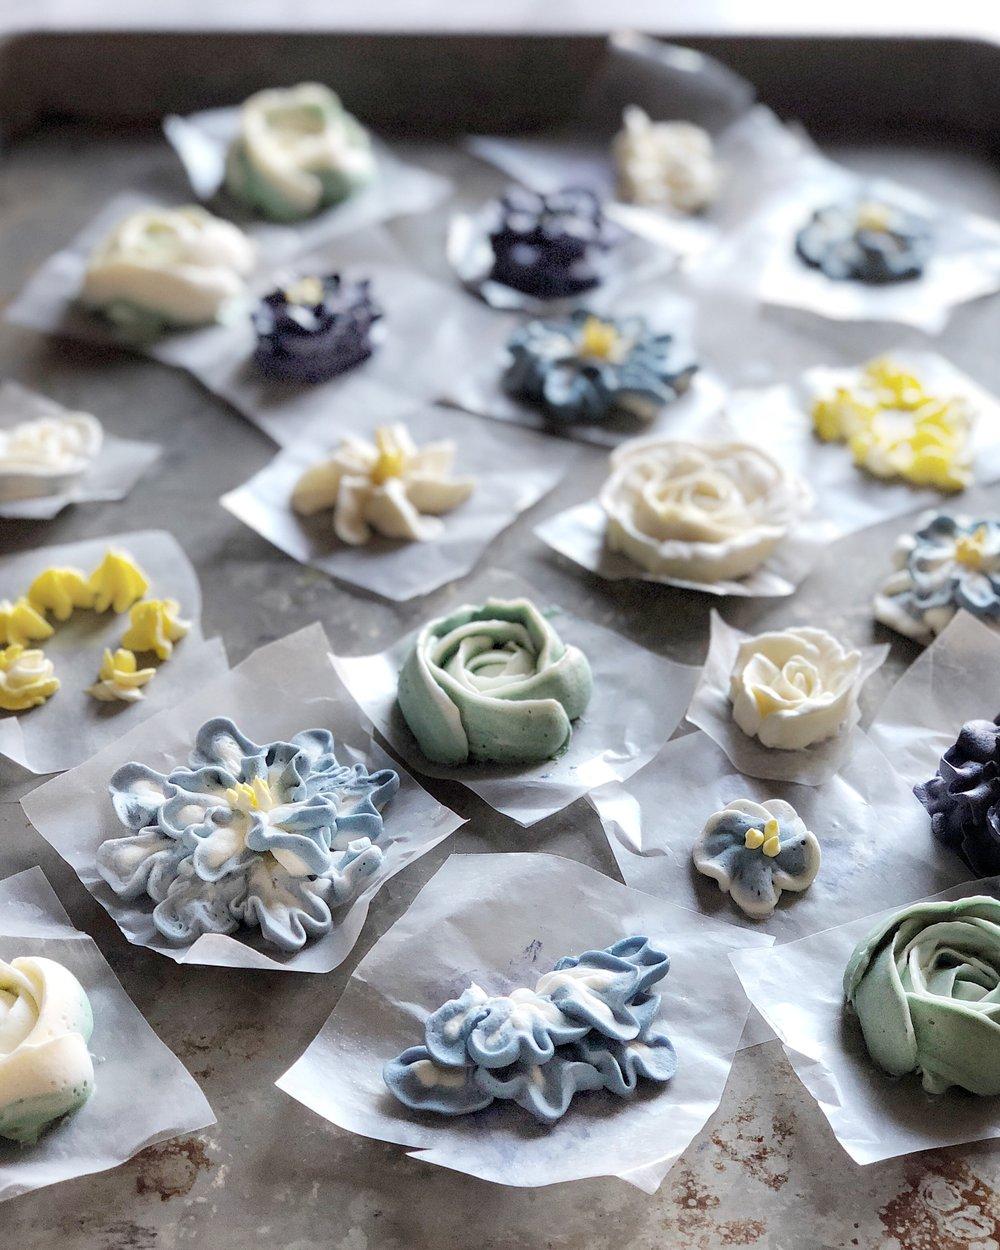 judy kim floral cake decorating workshop